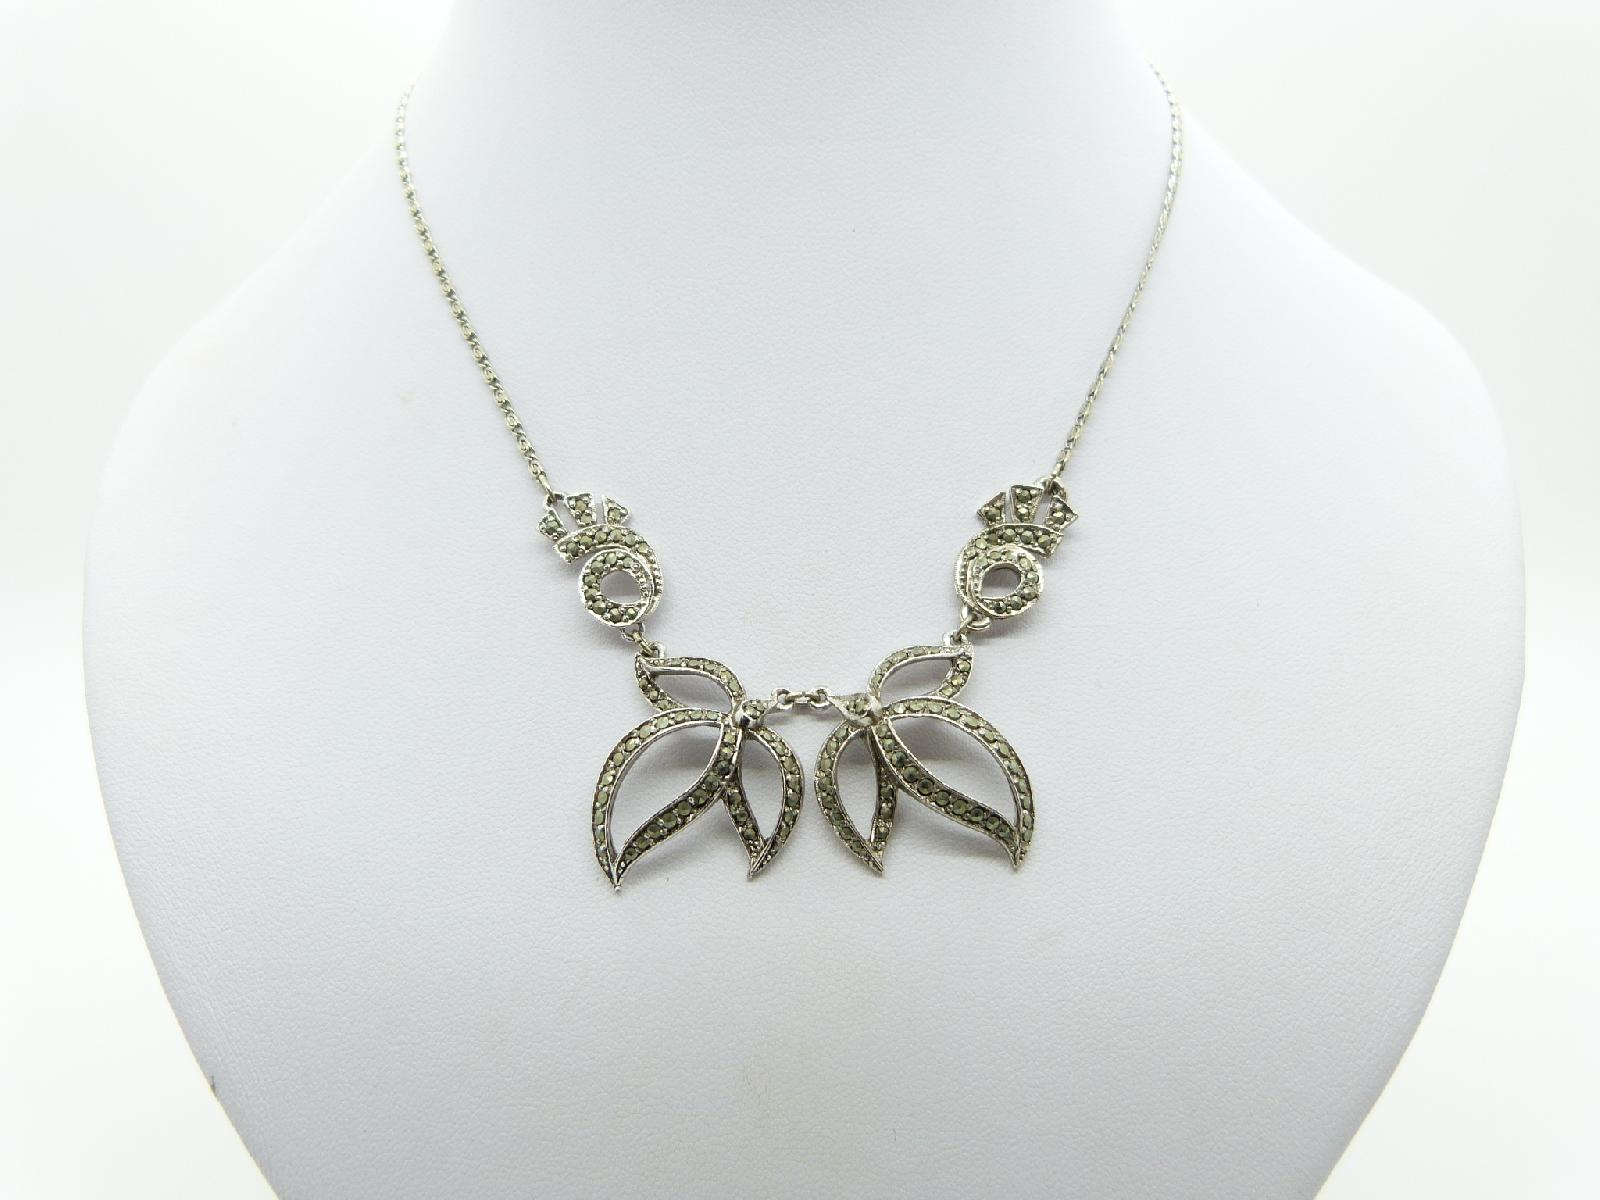 Vintage 30s Beautiful Marcasite Floral Drop Design Silvertone Necklace 40cms